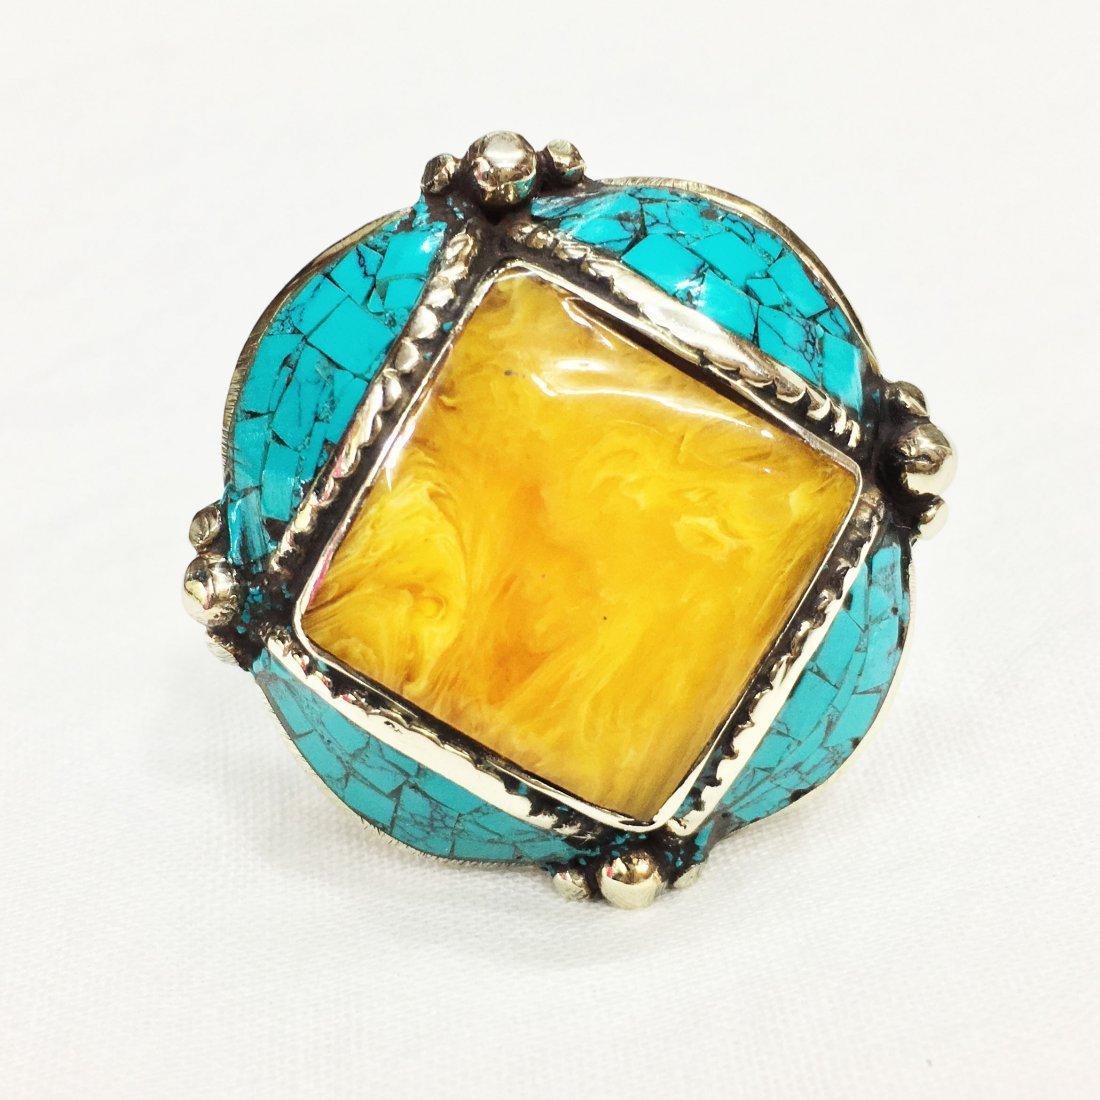 Free Size - Turquoise & Amber Tibetan Silver Ring